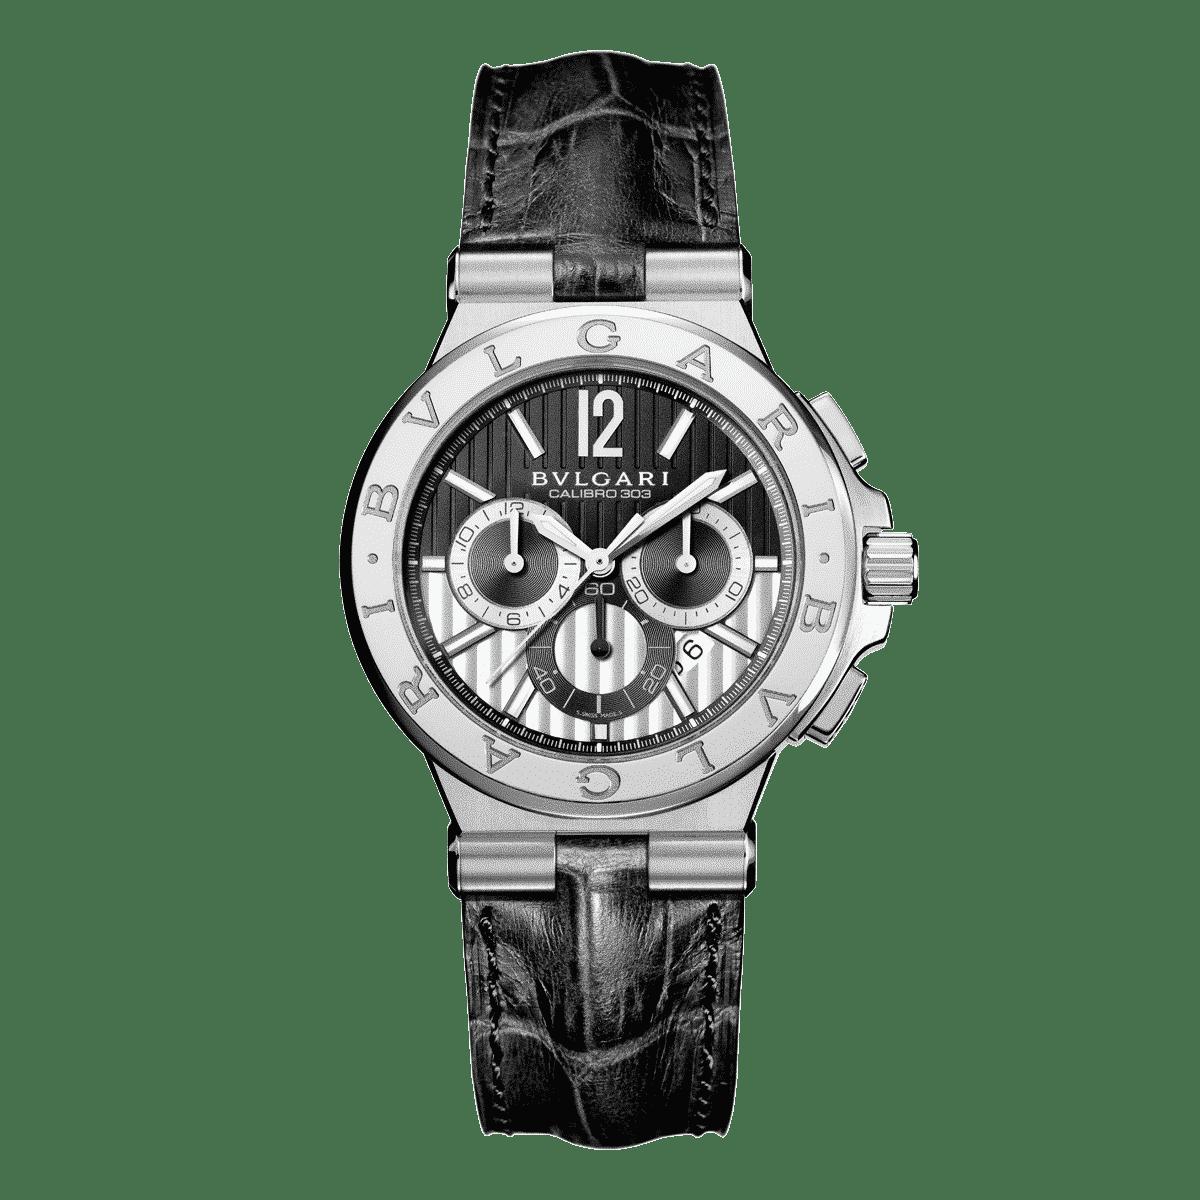 e73f598ff01 Bulgari Diagono Chronograph - Lionel Meylan Vevey